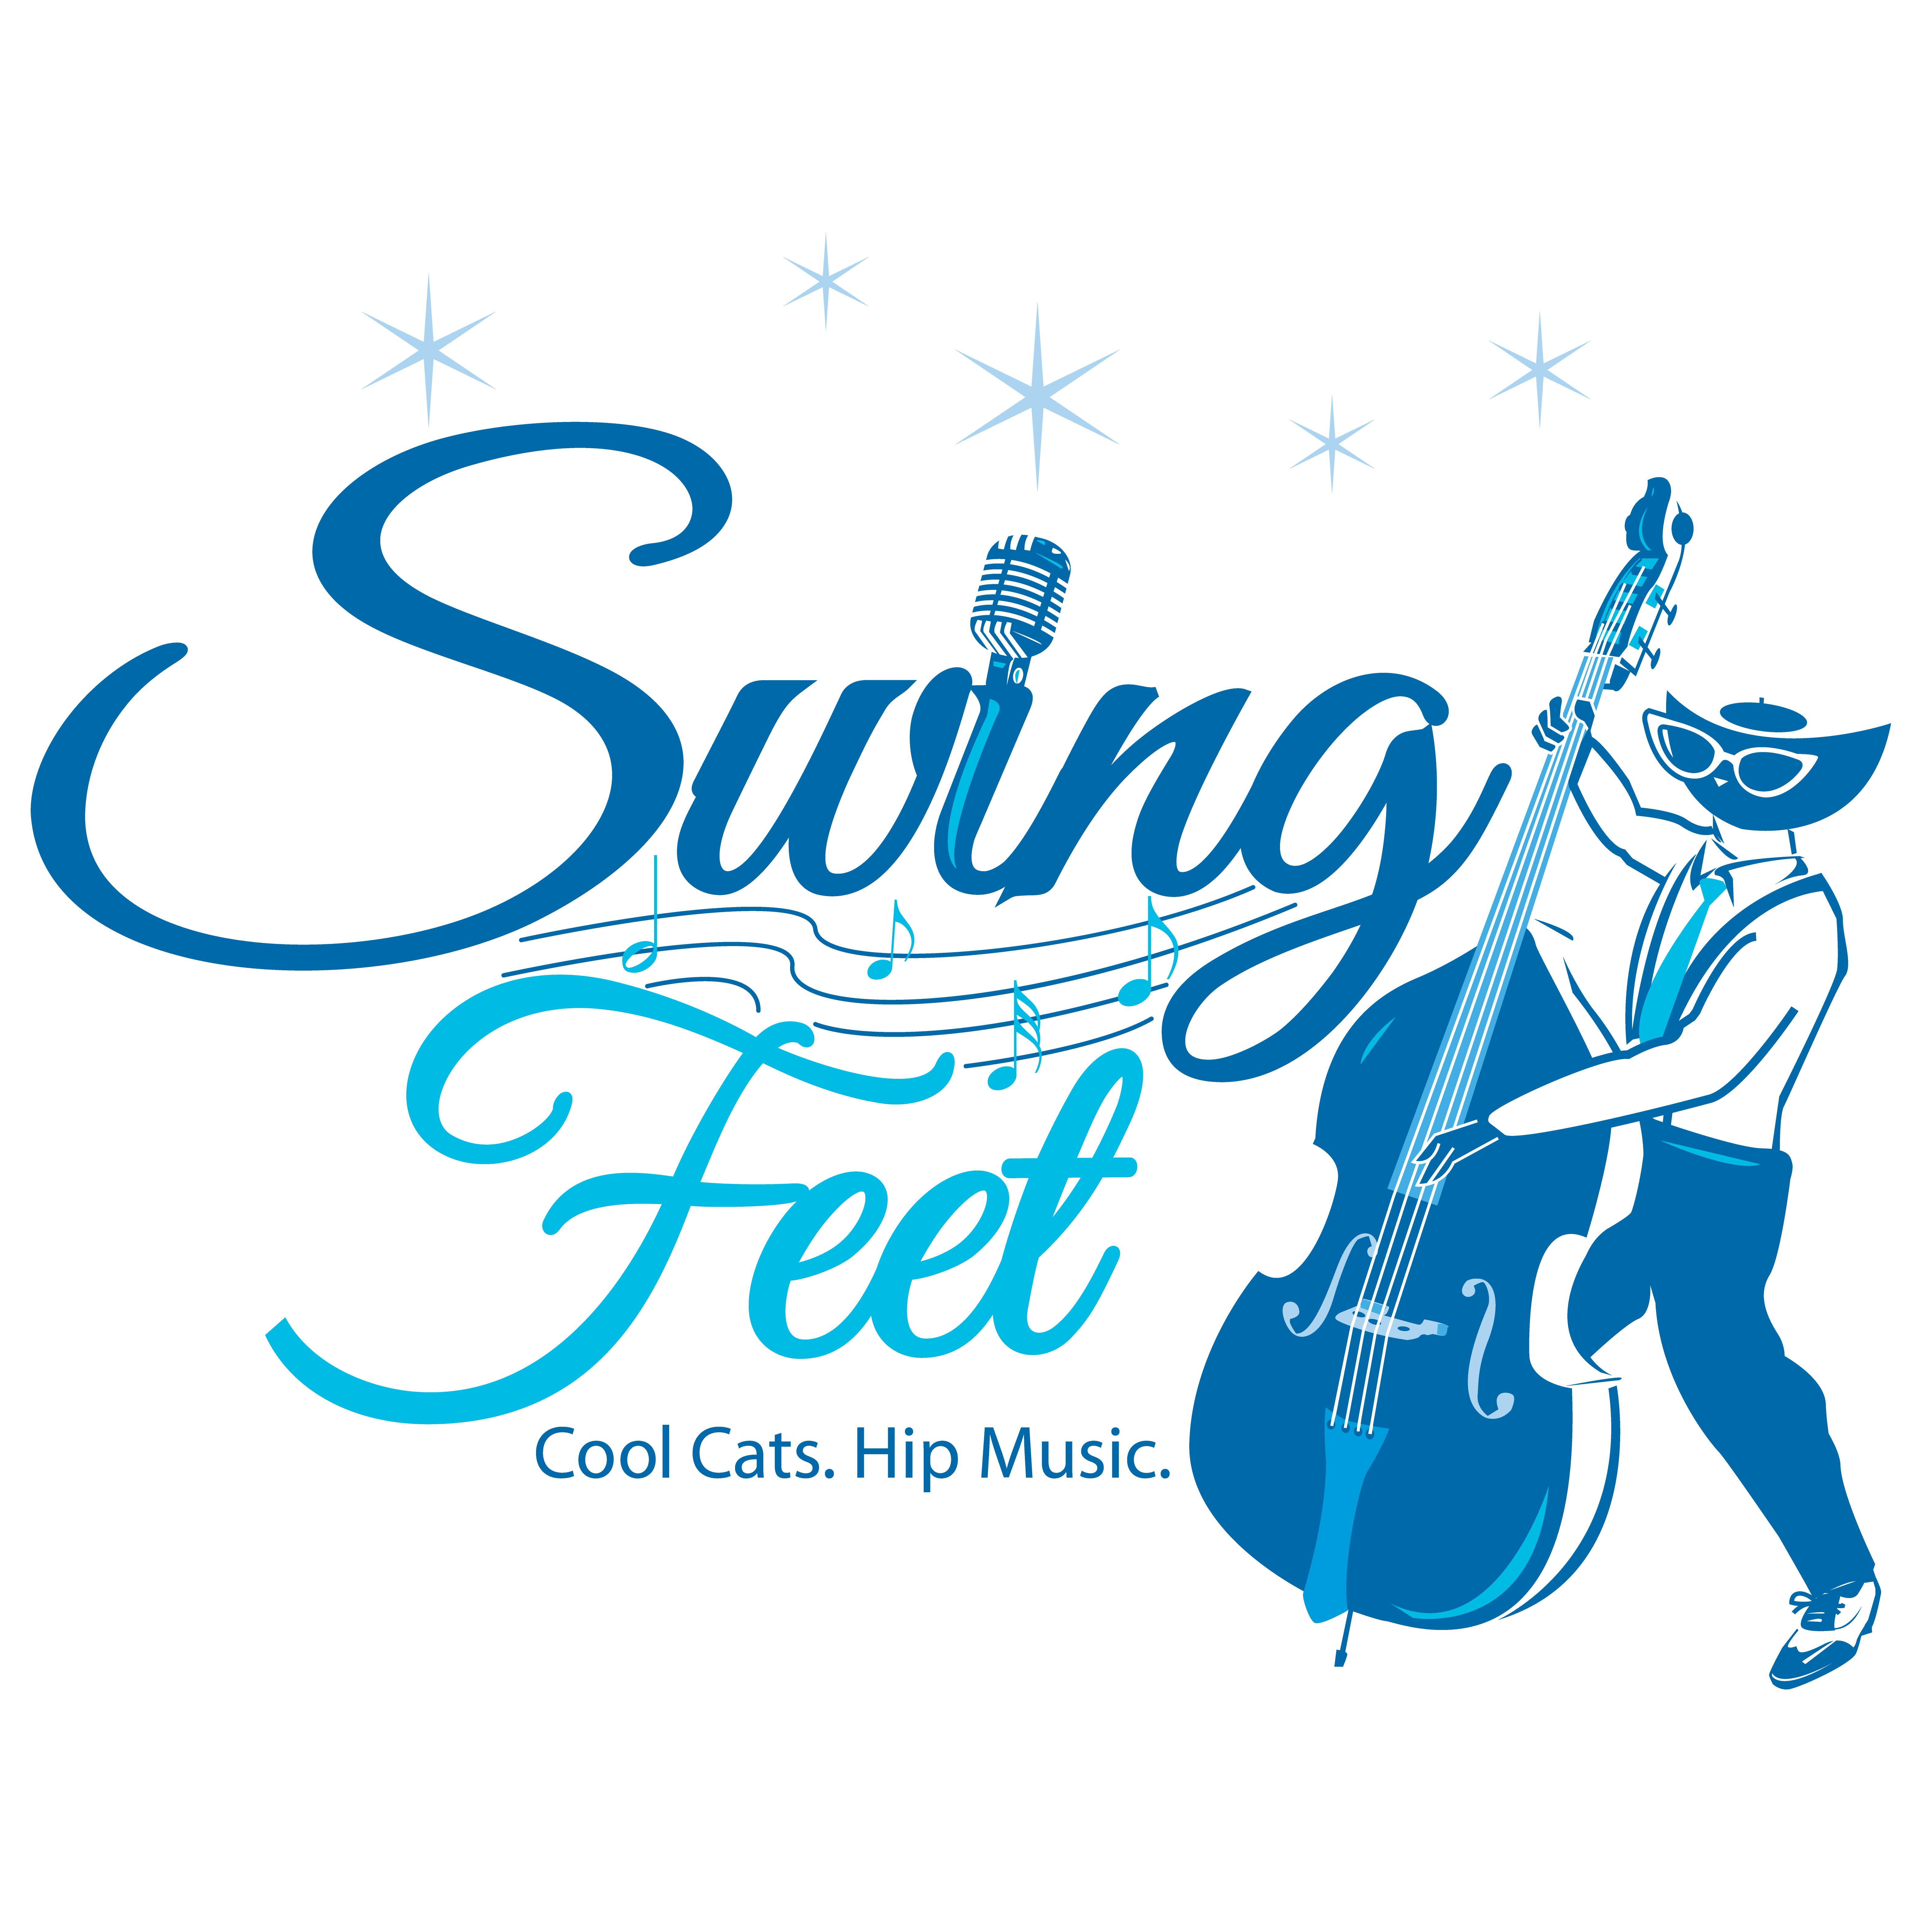 Swing Feet — Cool Cats. Hip Music. - Swing Feet — Cool Cats. Hip Music.